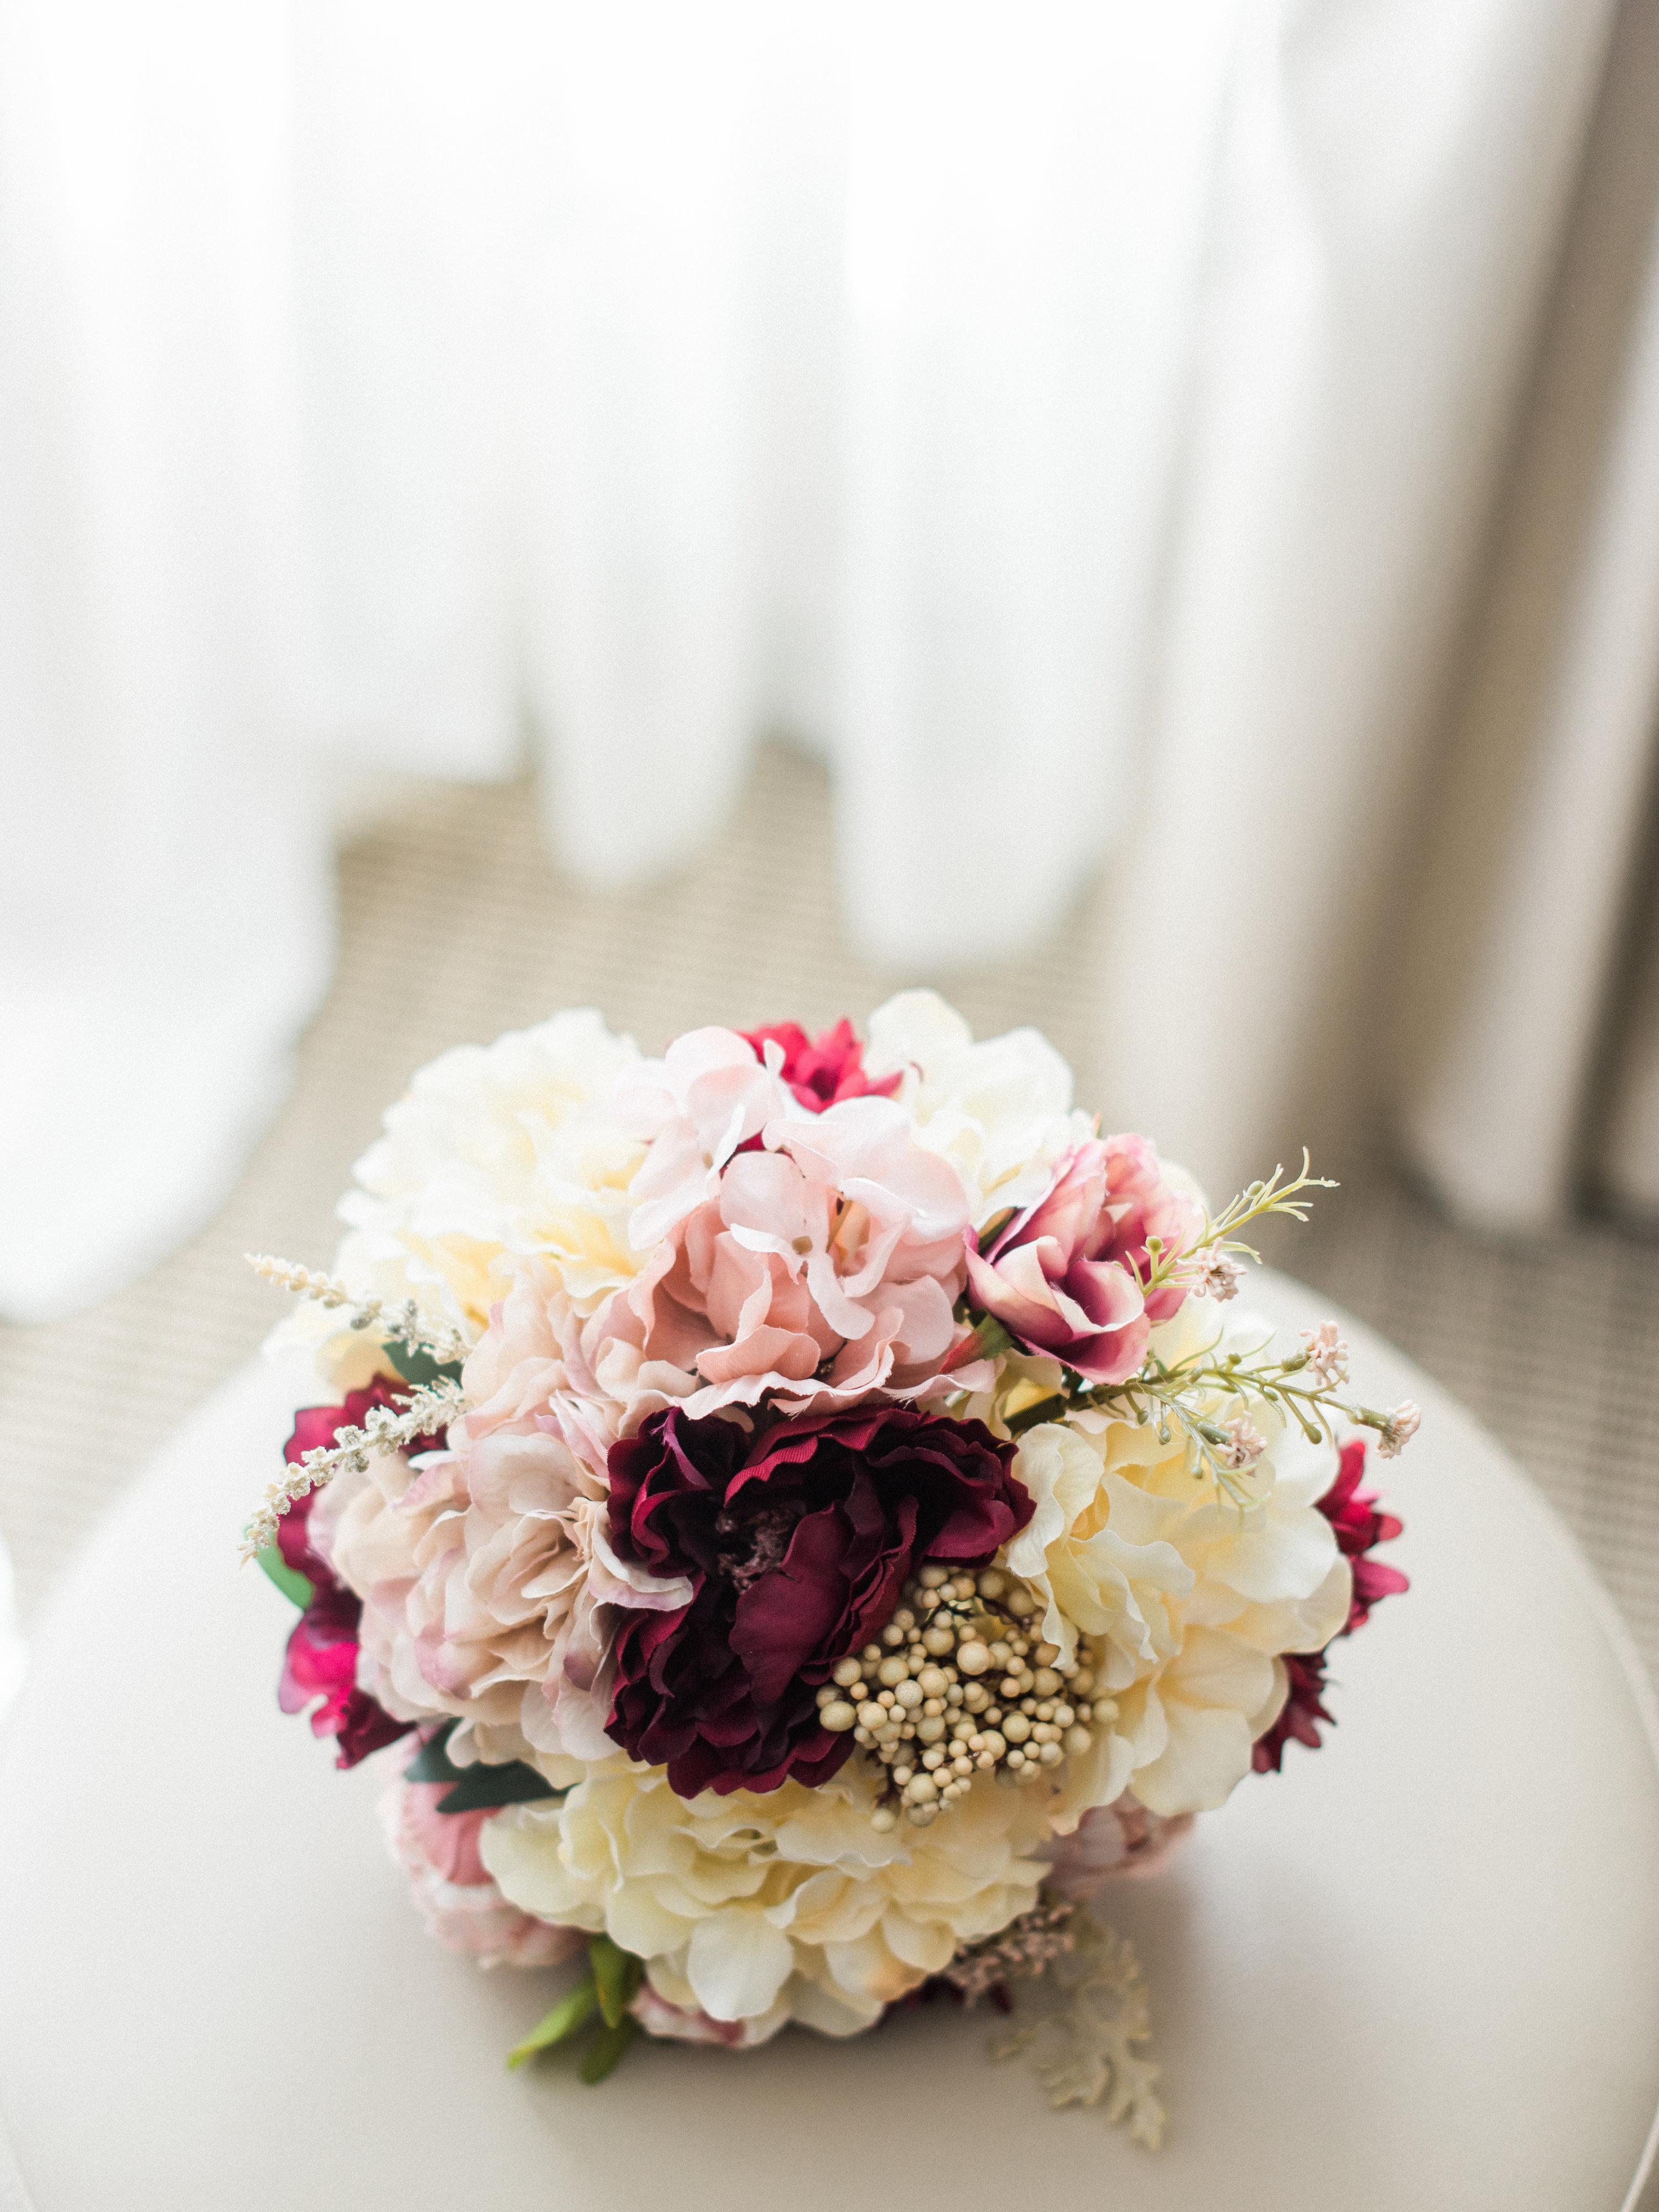 shanice & stephen wedding bouquet